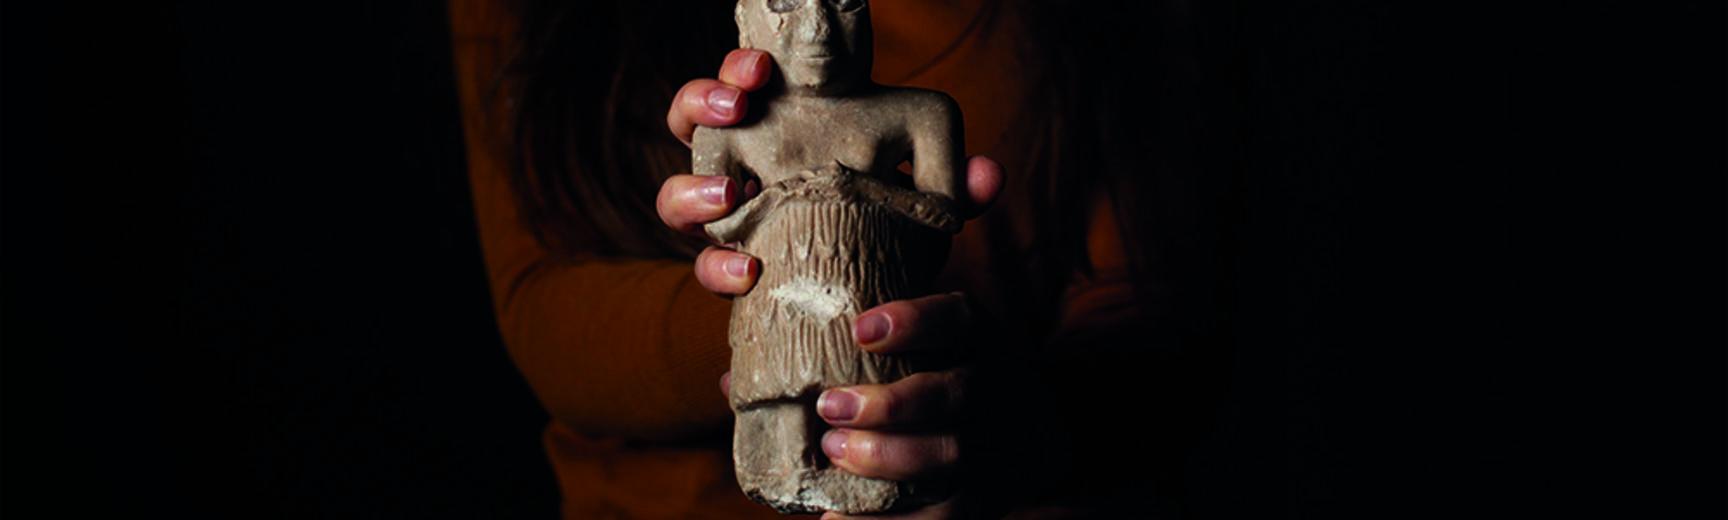 woman holding mesopotamian figurine statue mesopotamia Iraq 2021 owning the past